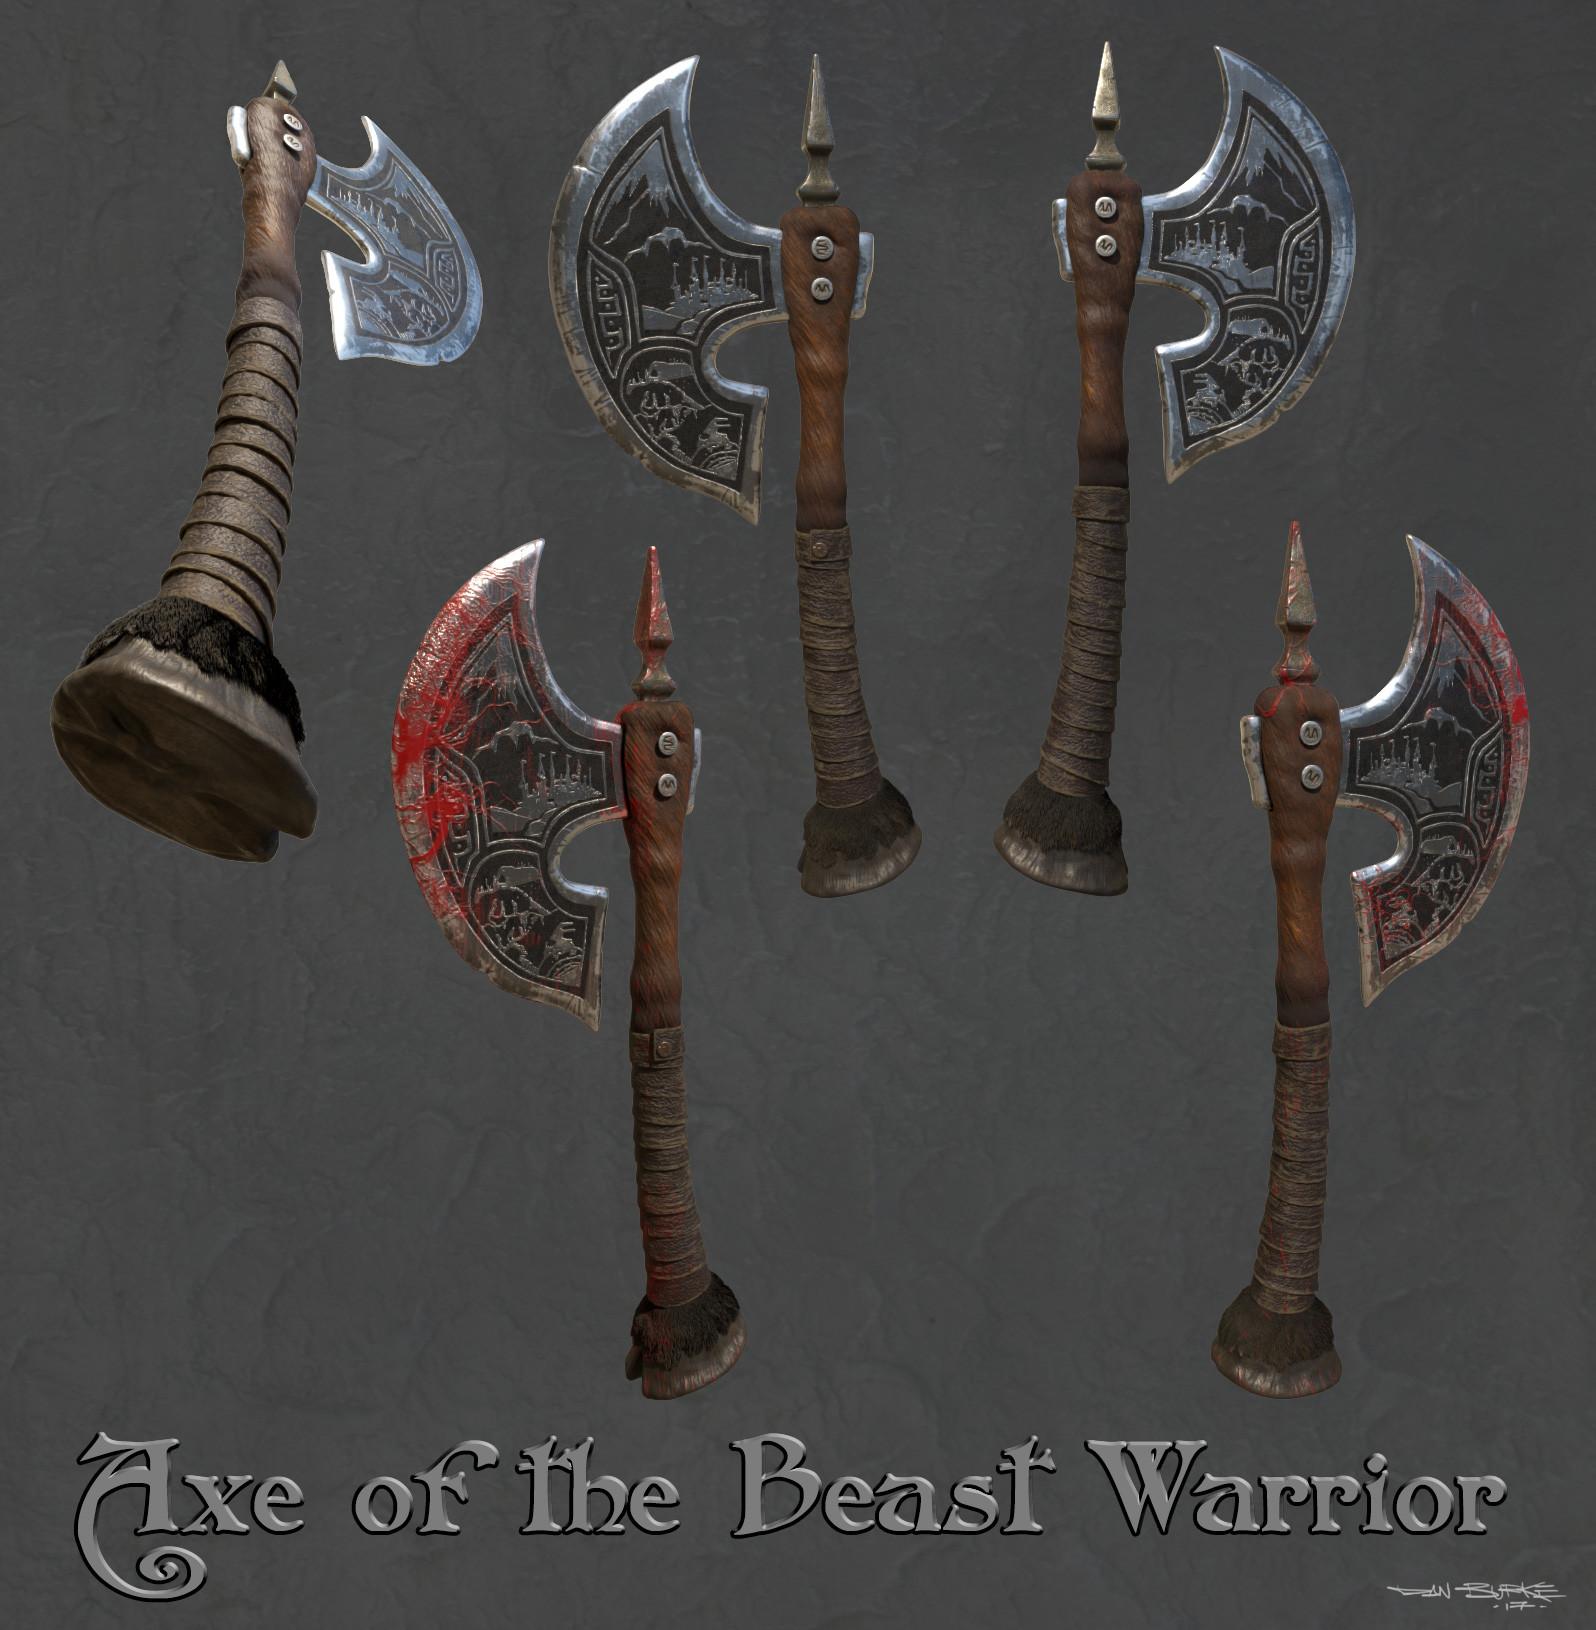 Axe of the Beast Warrior